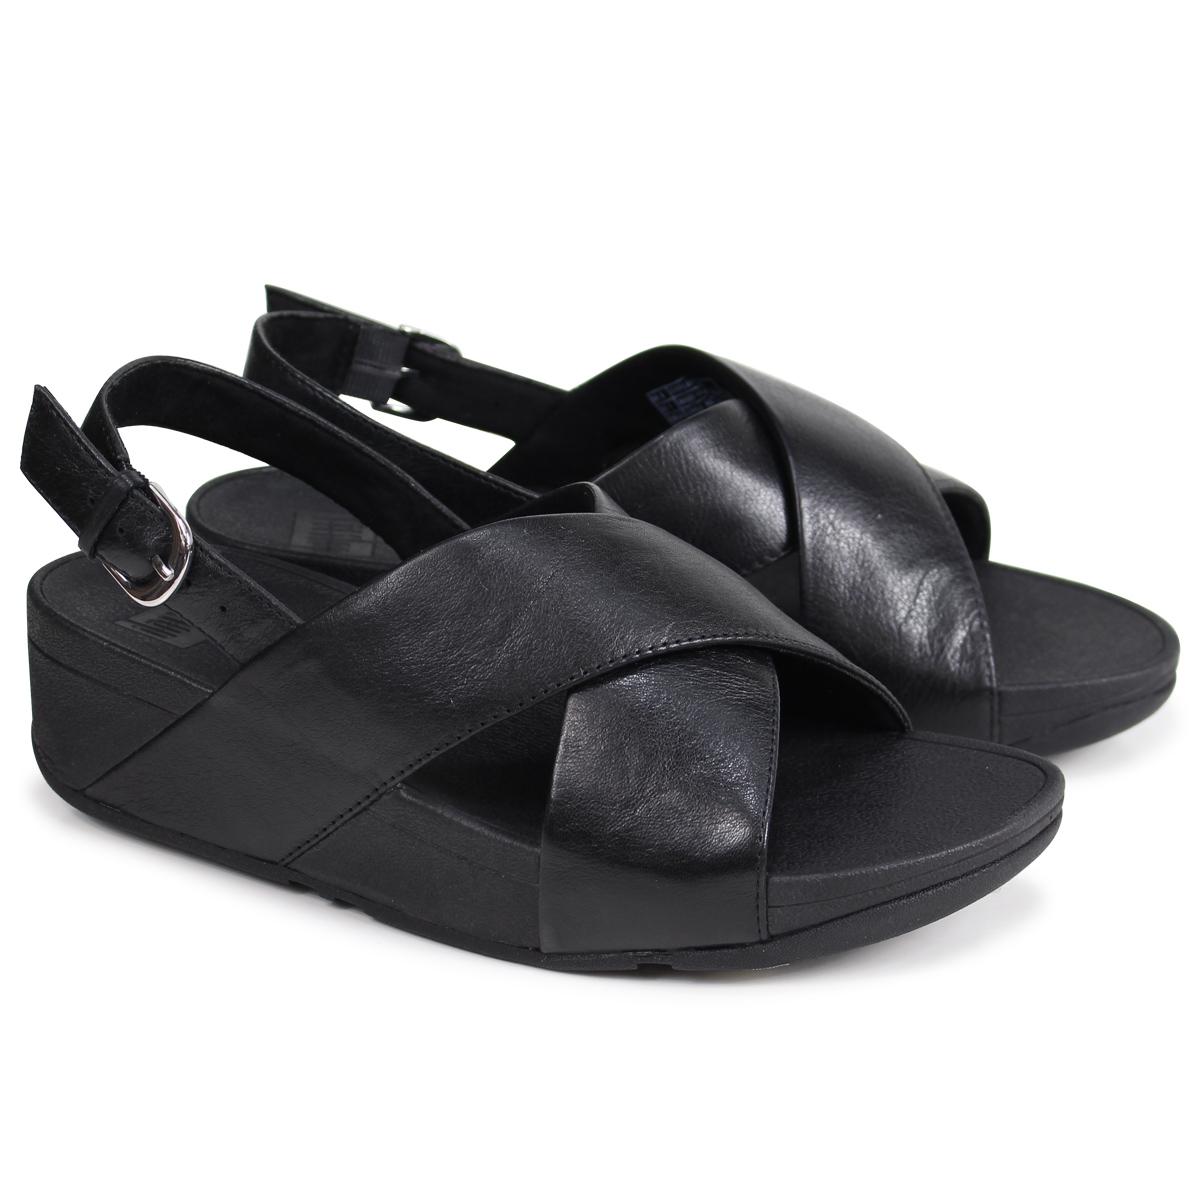 210b76654799c4 FitFlop LULU CROSS BACK-STRAP SANDALS LEATHER sandals fitting FLOP Lulu  Lady s K03 black  4 4 Shinnyu load